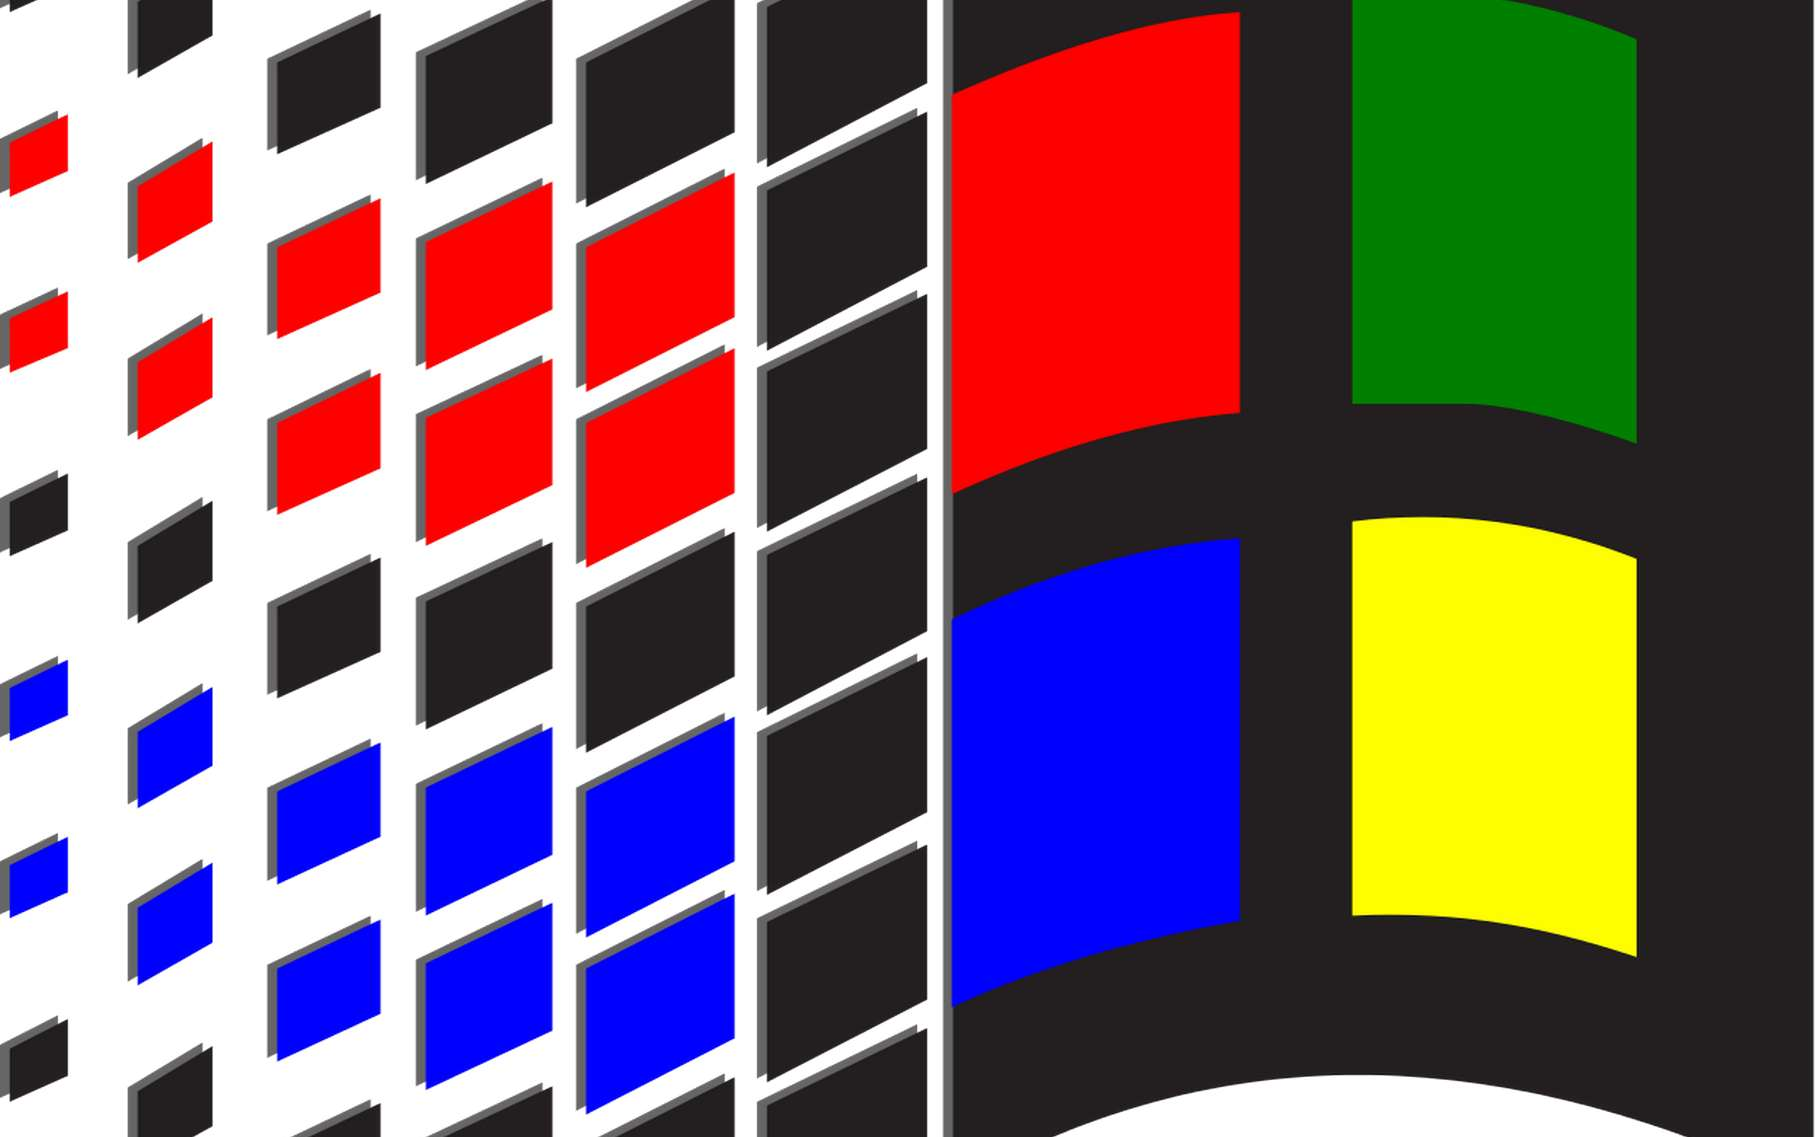 Le fameux logo de Windows 3.1. © Microsoft, DP, Wikimedia Commons